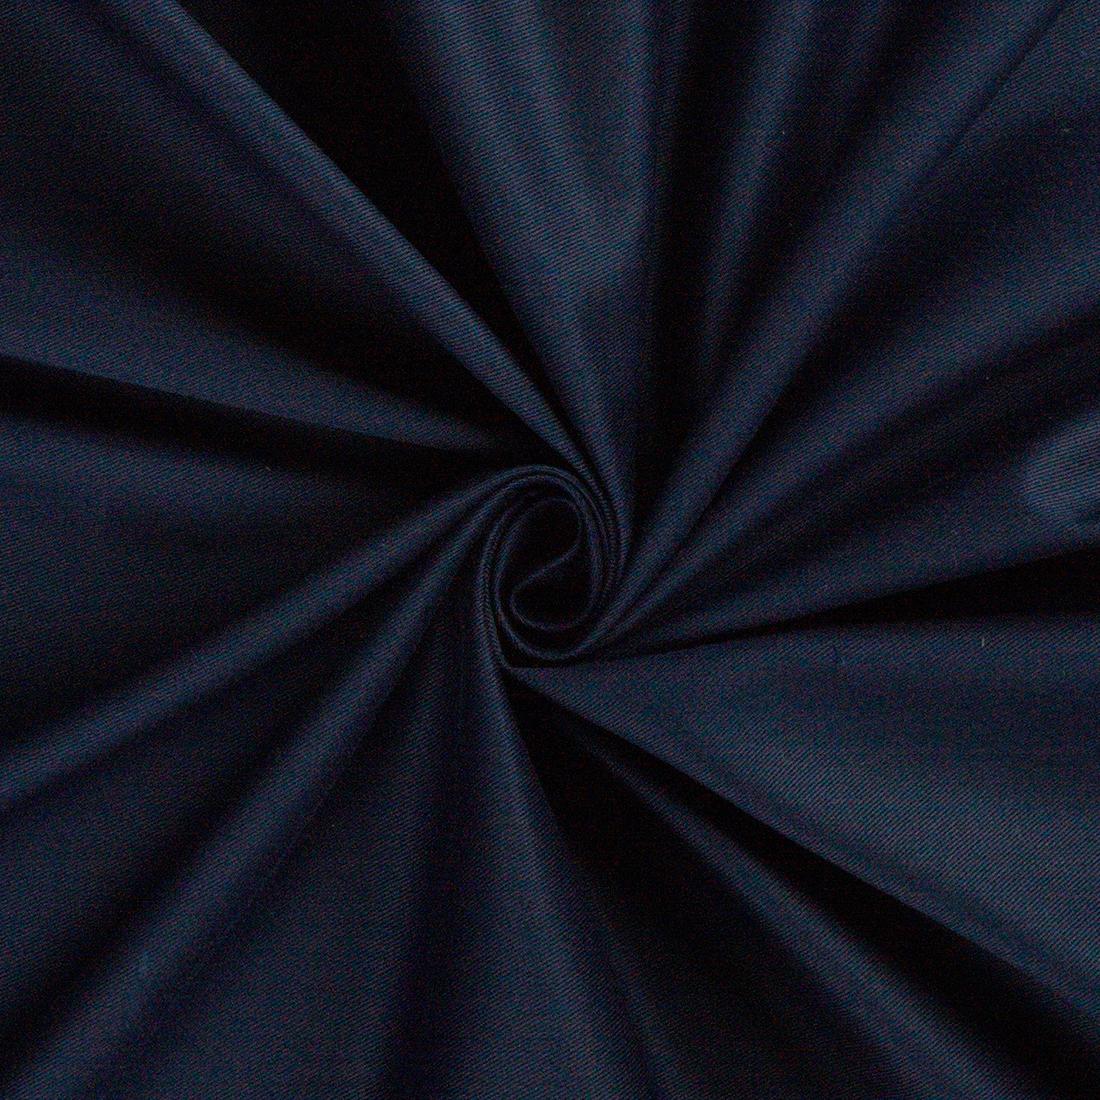 Gaberchino Navy Dress Fabric